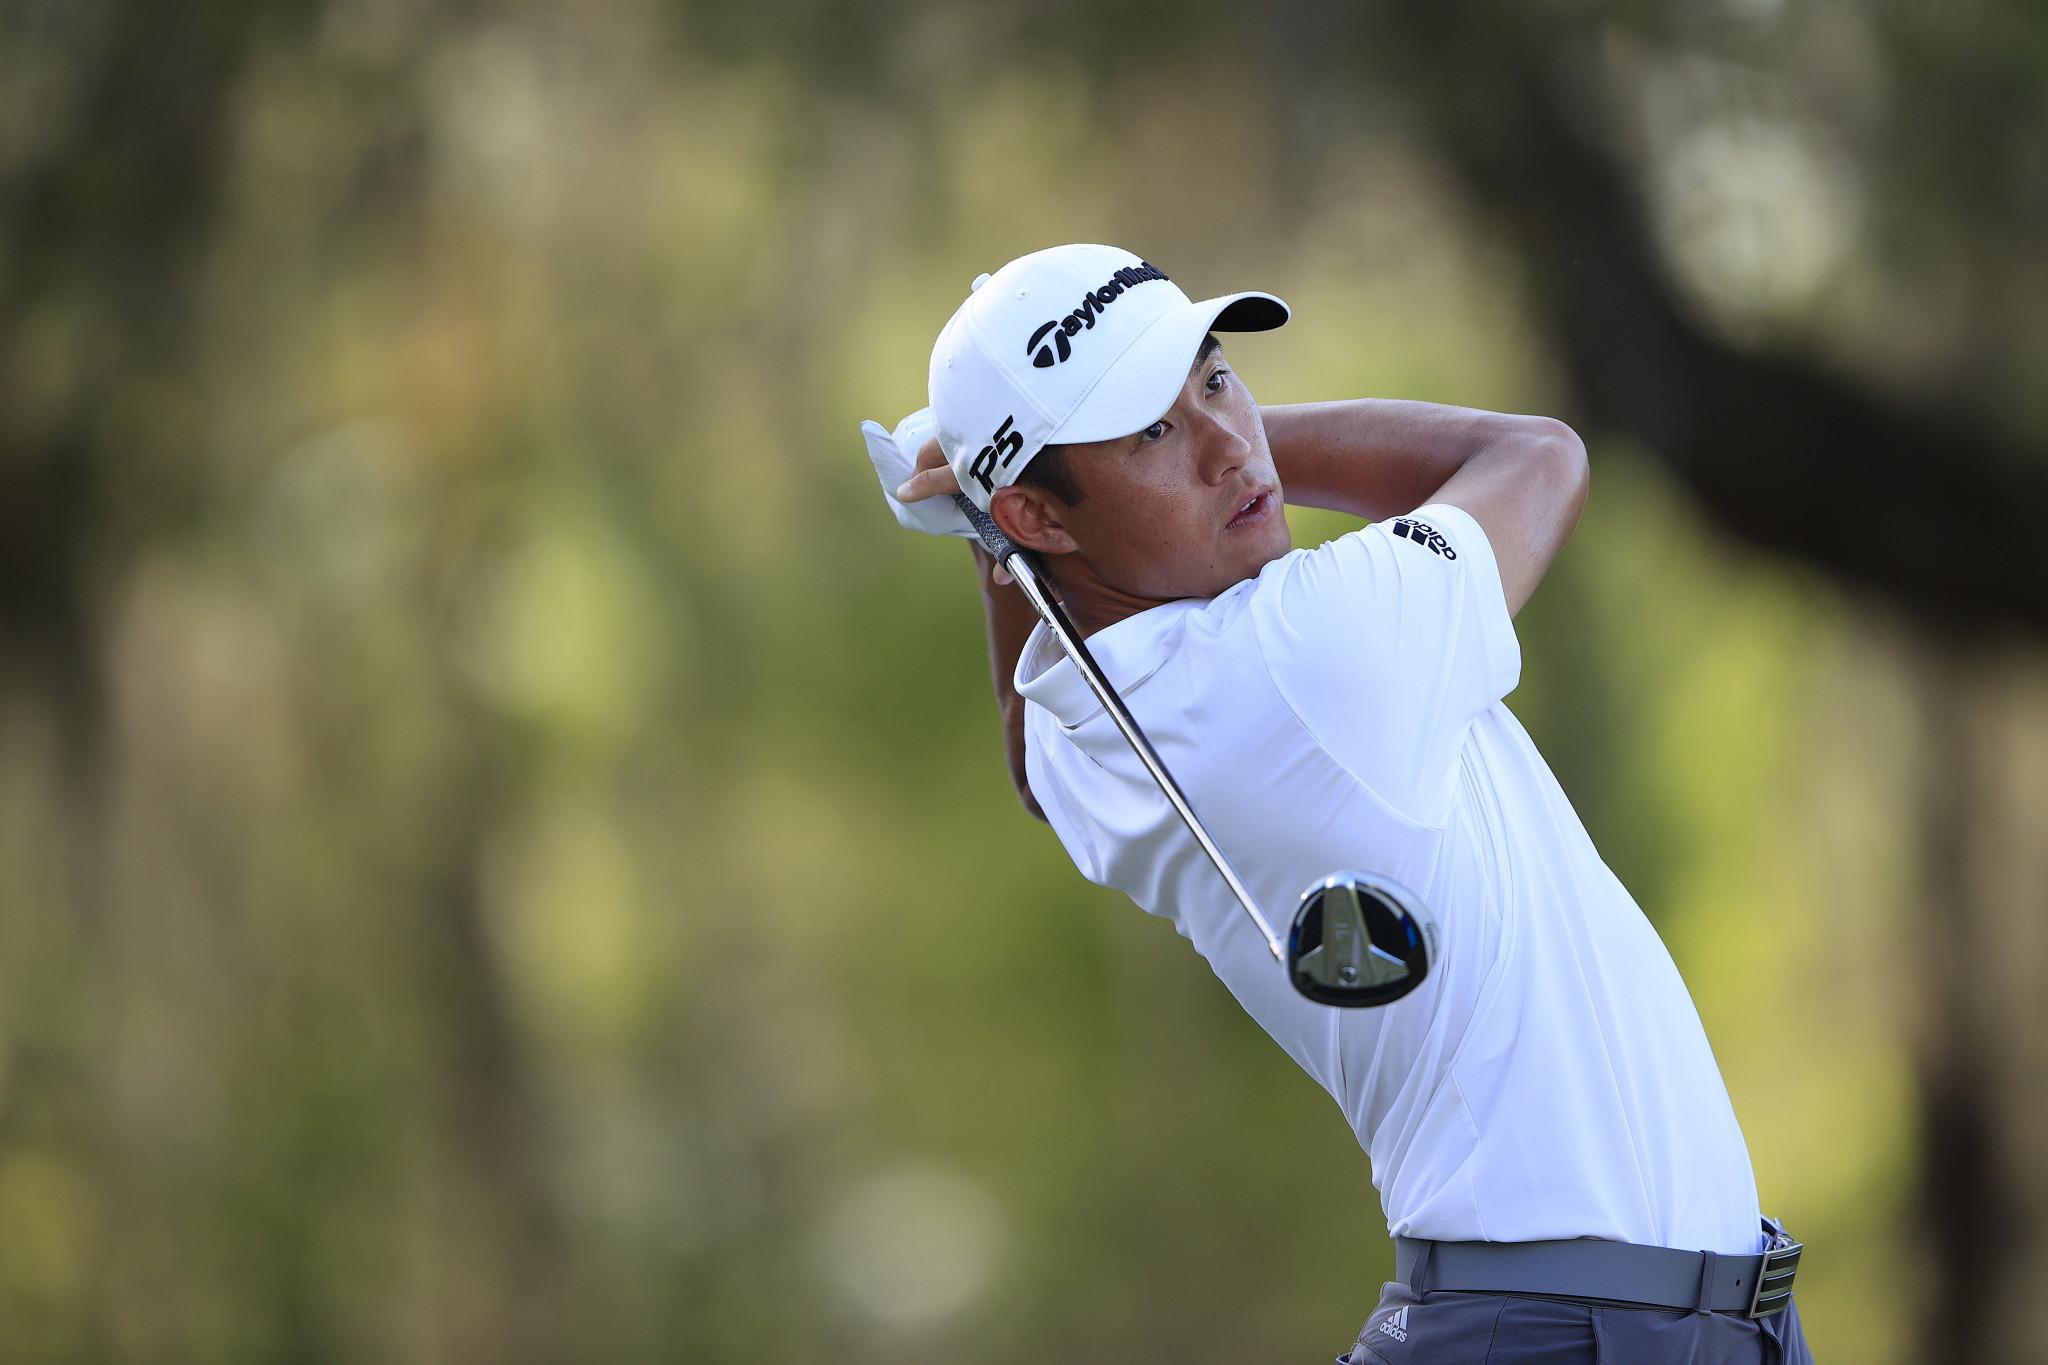 Morikawa seizes two-shot lead at WGC-Workday Championship